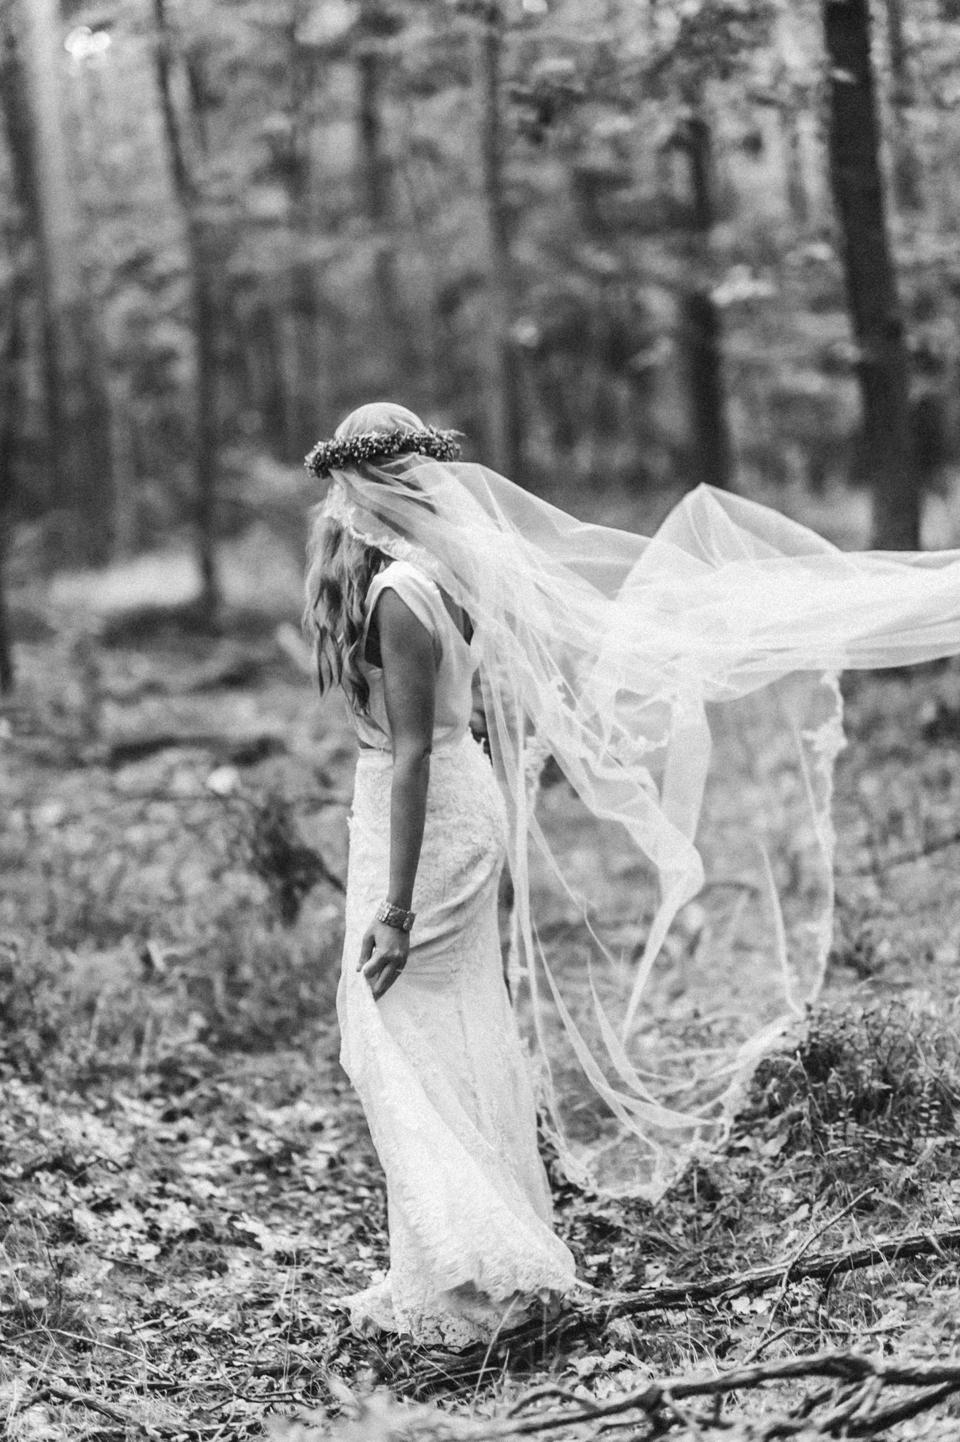 rembostyling-weddinginspiration-kreativ-wedding-wedding-belin-loft23_0422